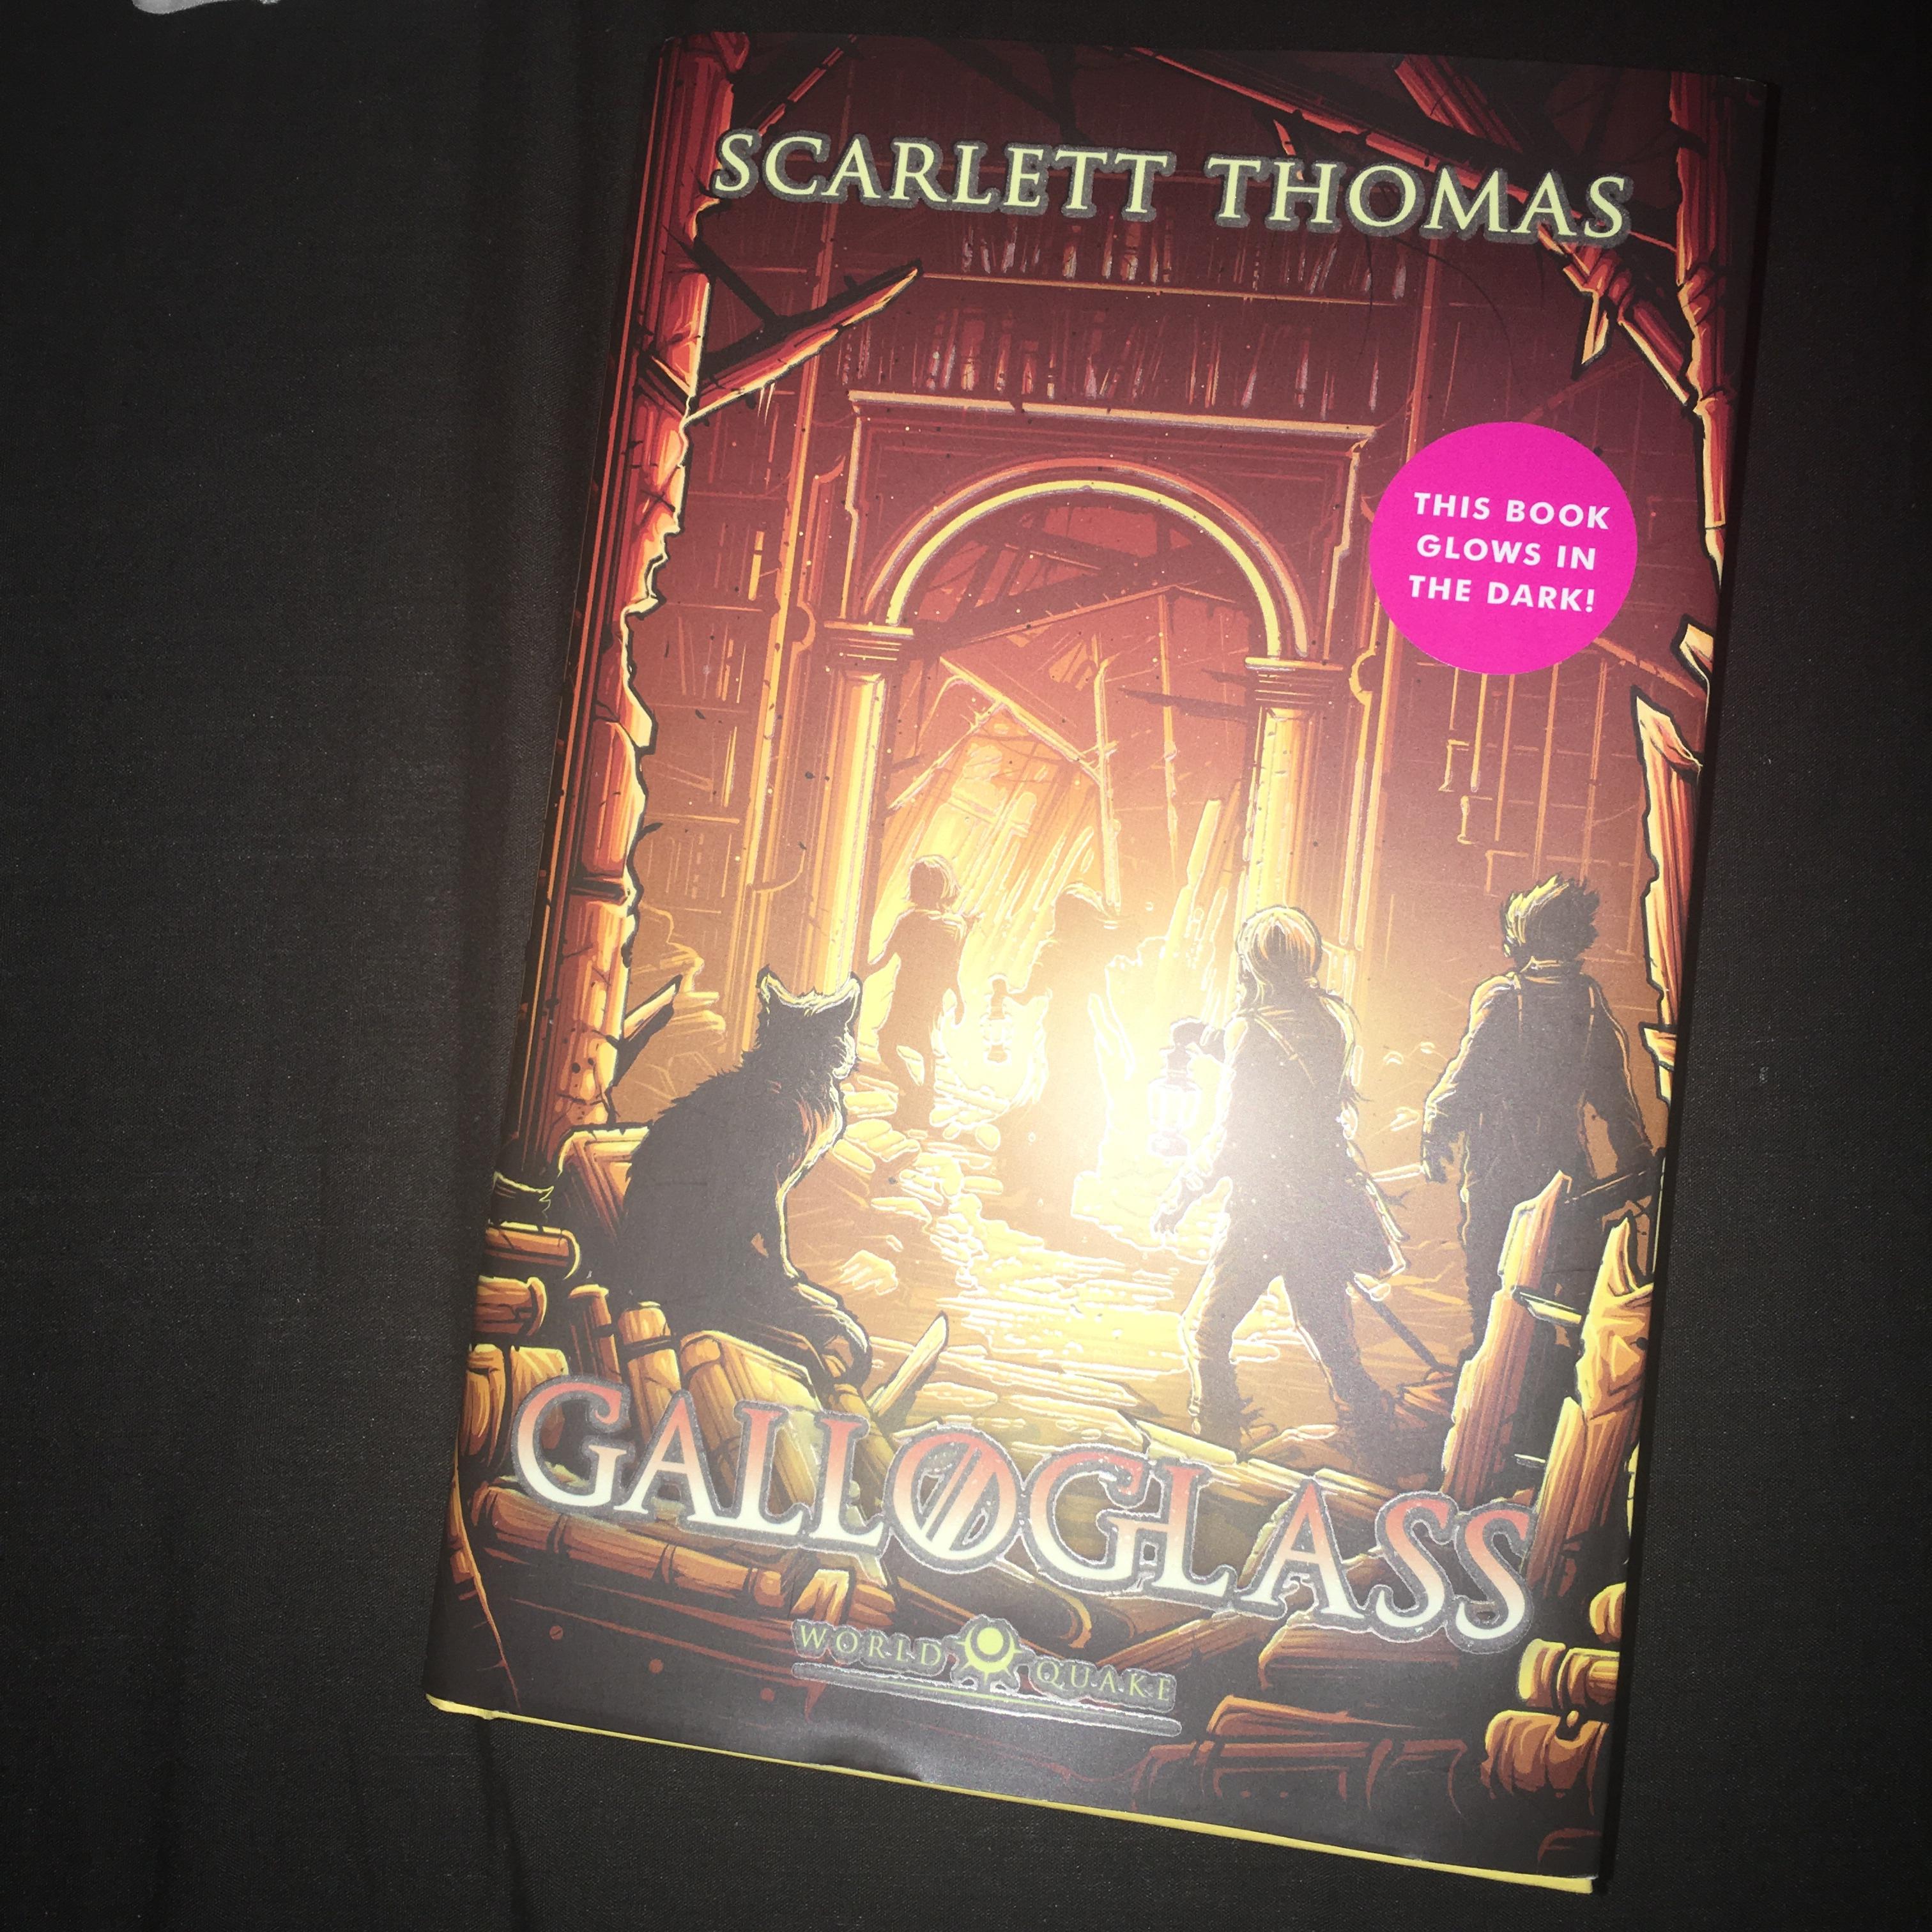 Galloglass Cover